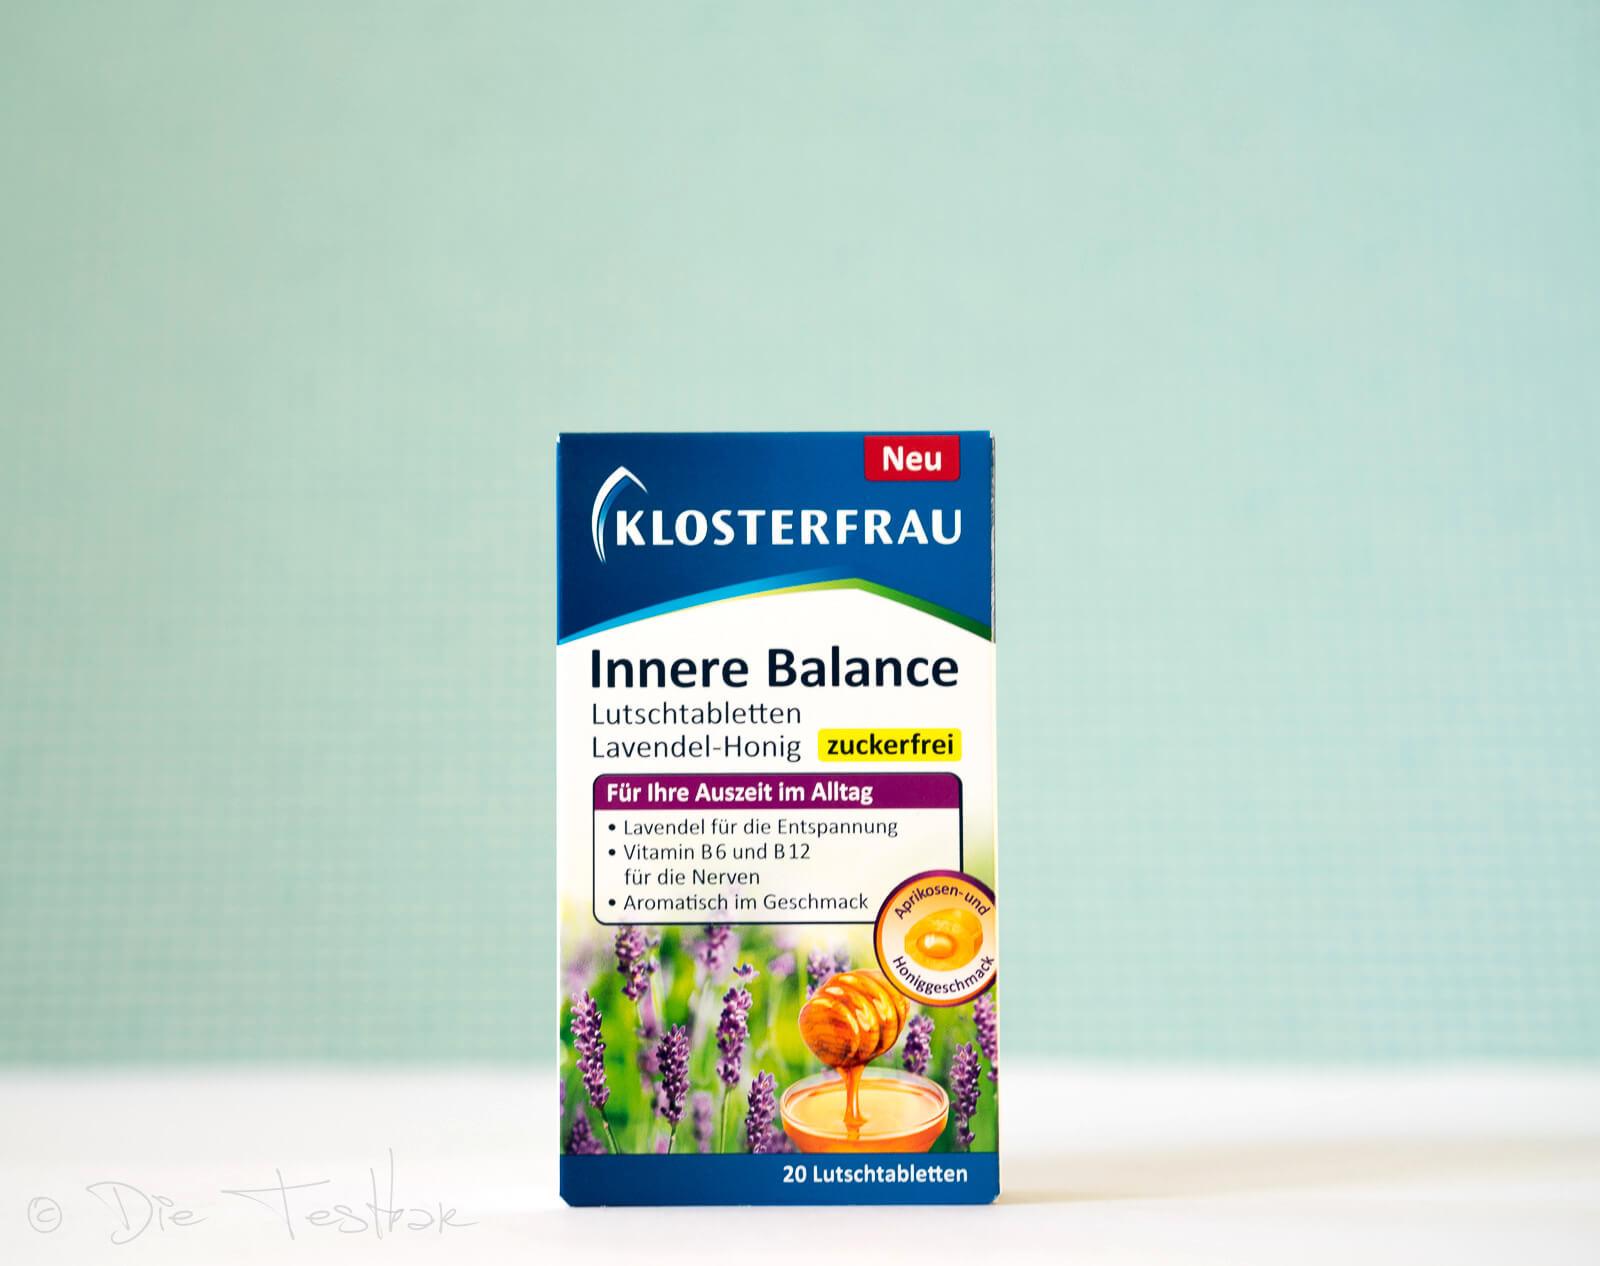 MCM Klosterfrau -MCM Klosterfrau - Innere Balance Lutschtabletten Lavendel-Honig